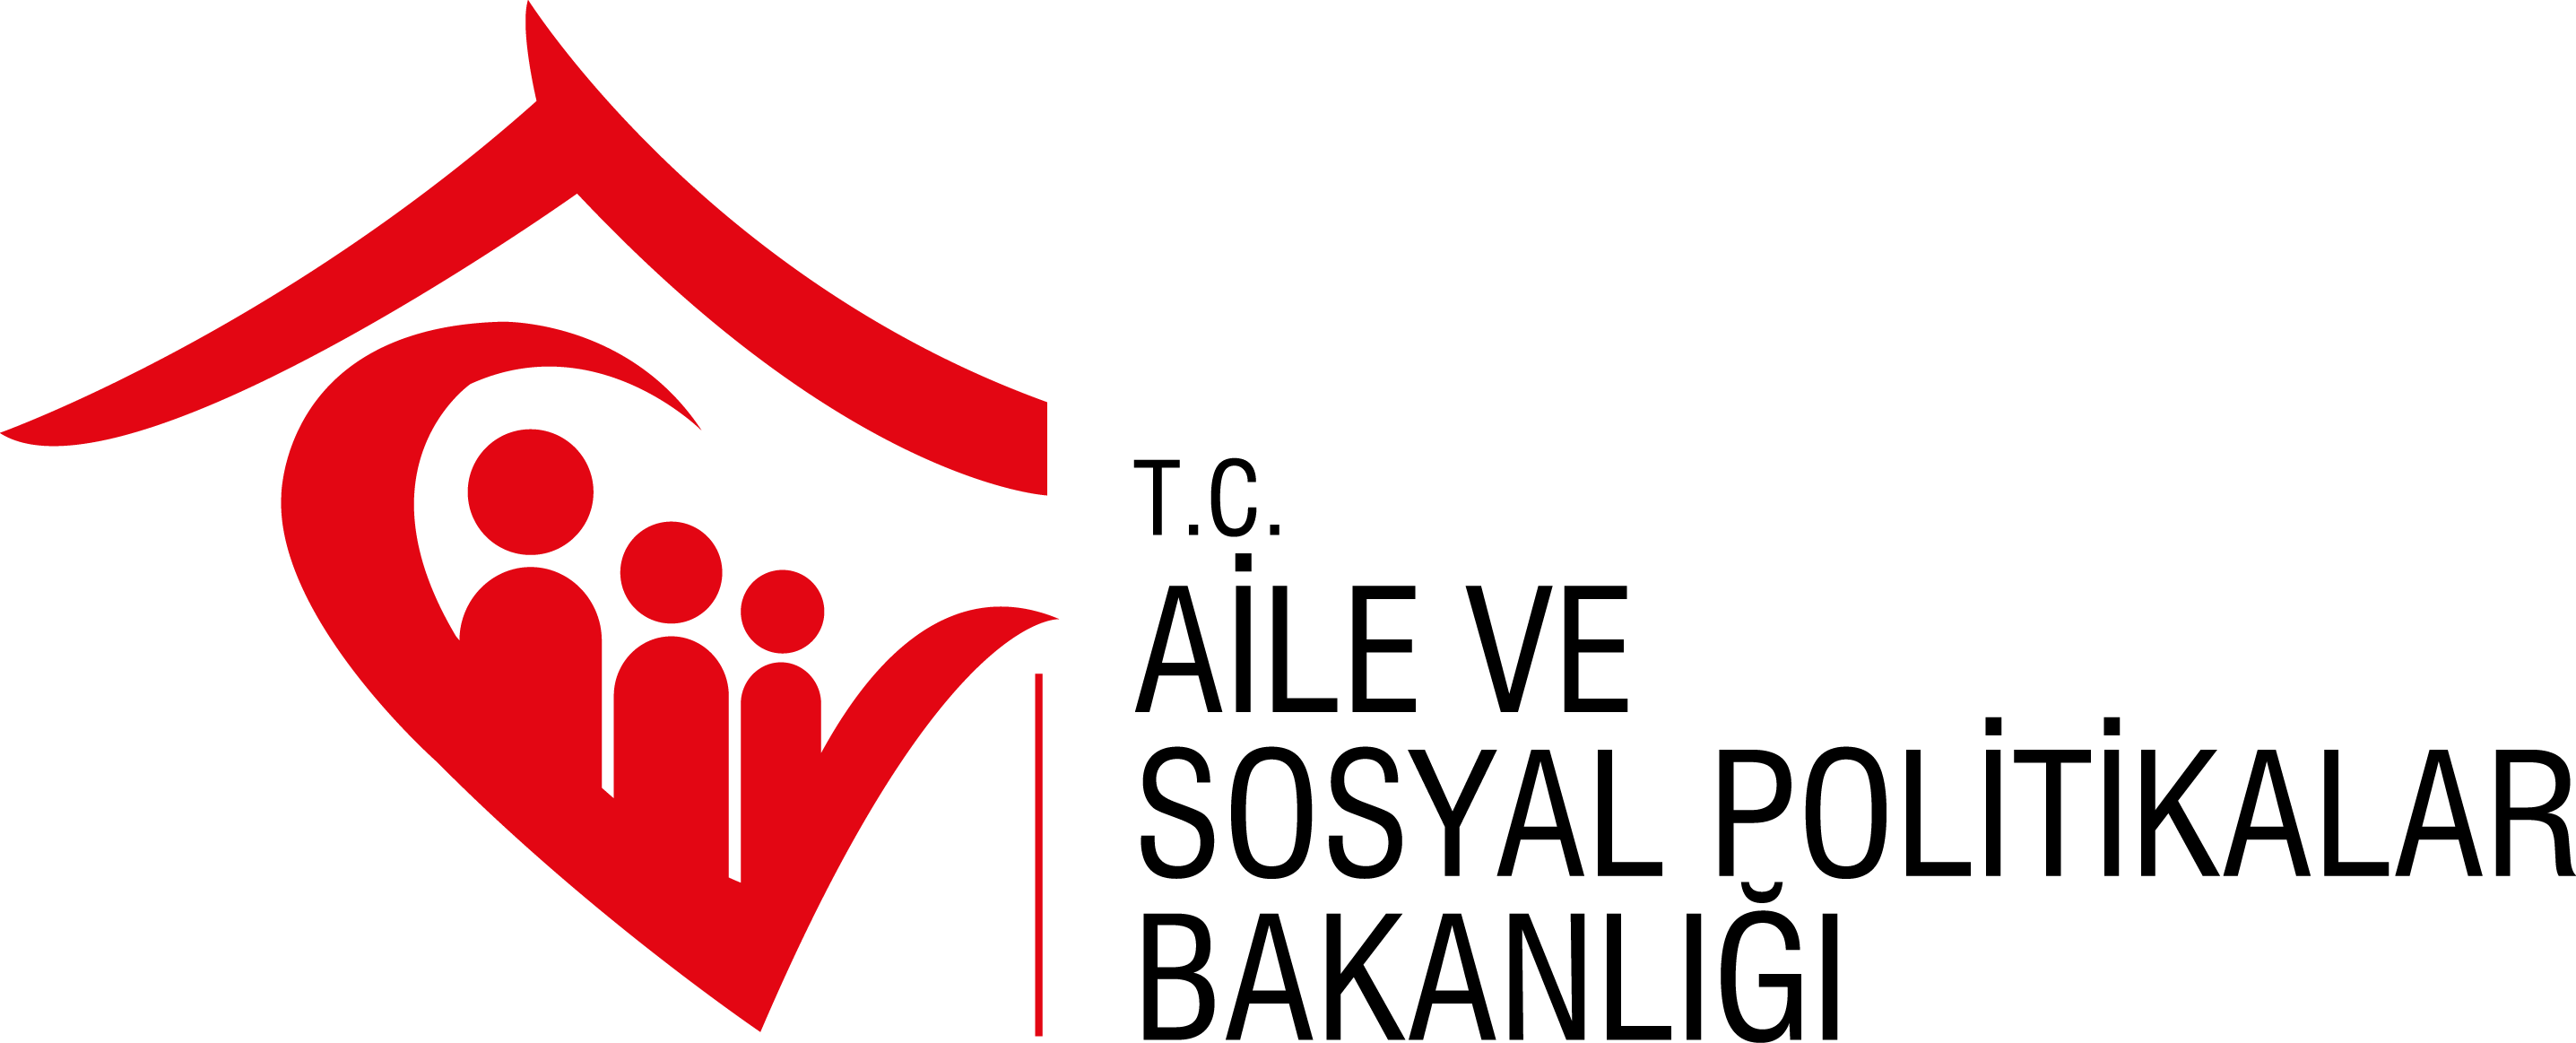 ailevesosyalpolitikalarbakanligi logo vector